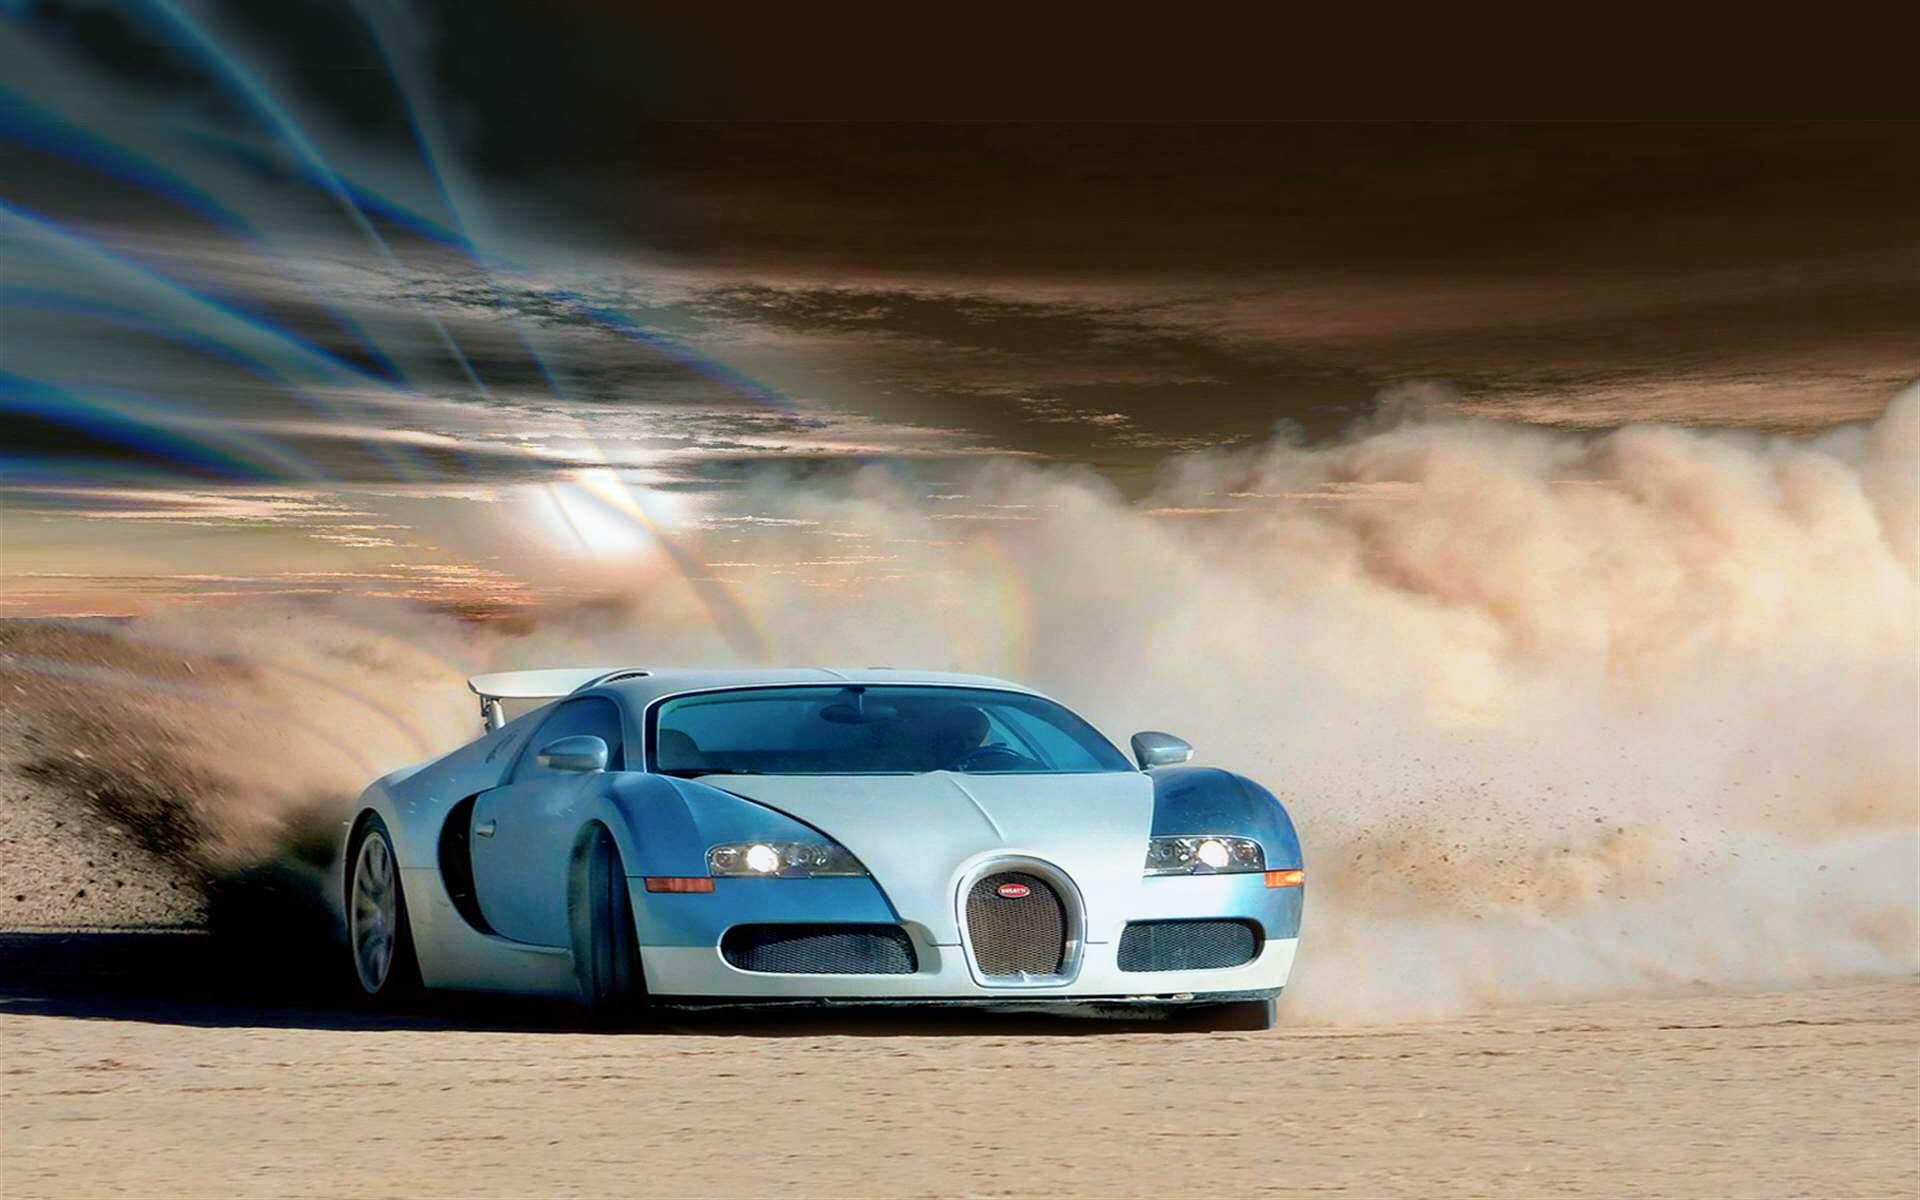 araba wallpaper,land vehicle,vehicle,car,supercar,sports car